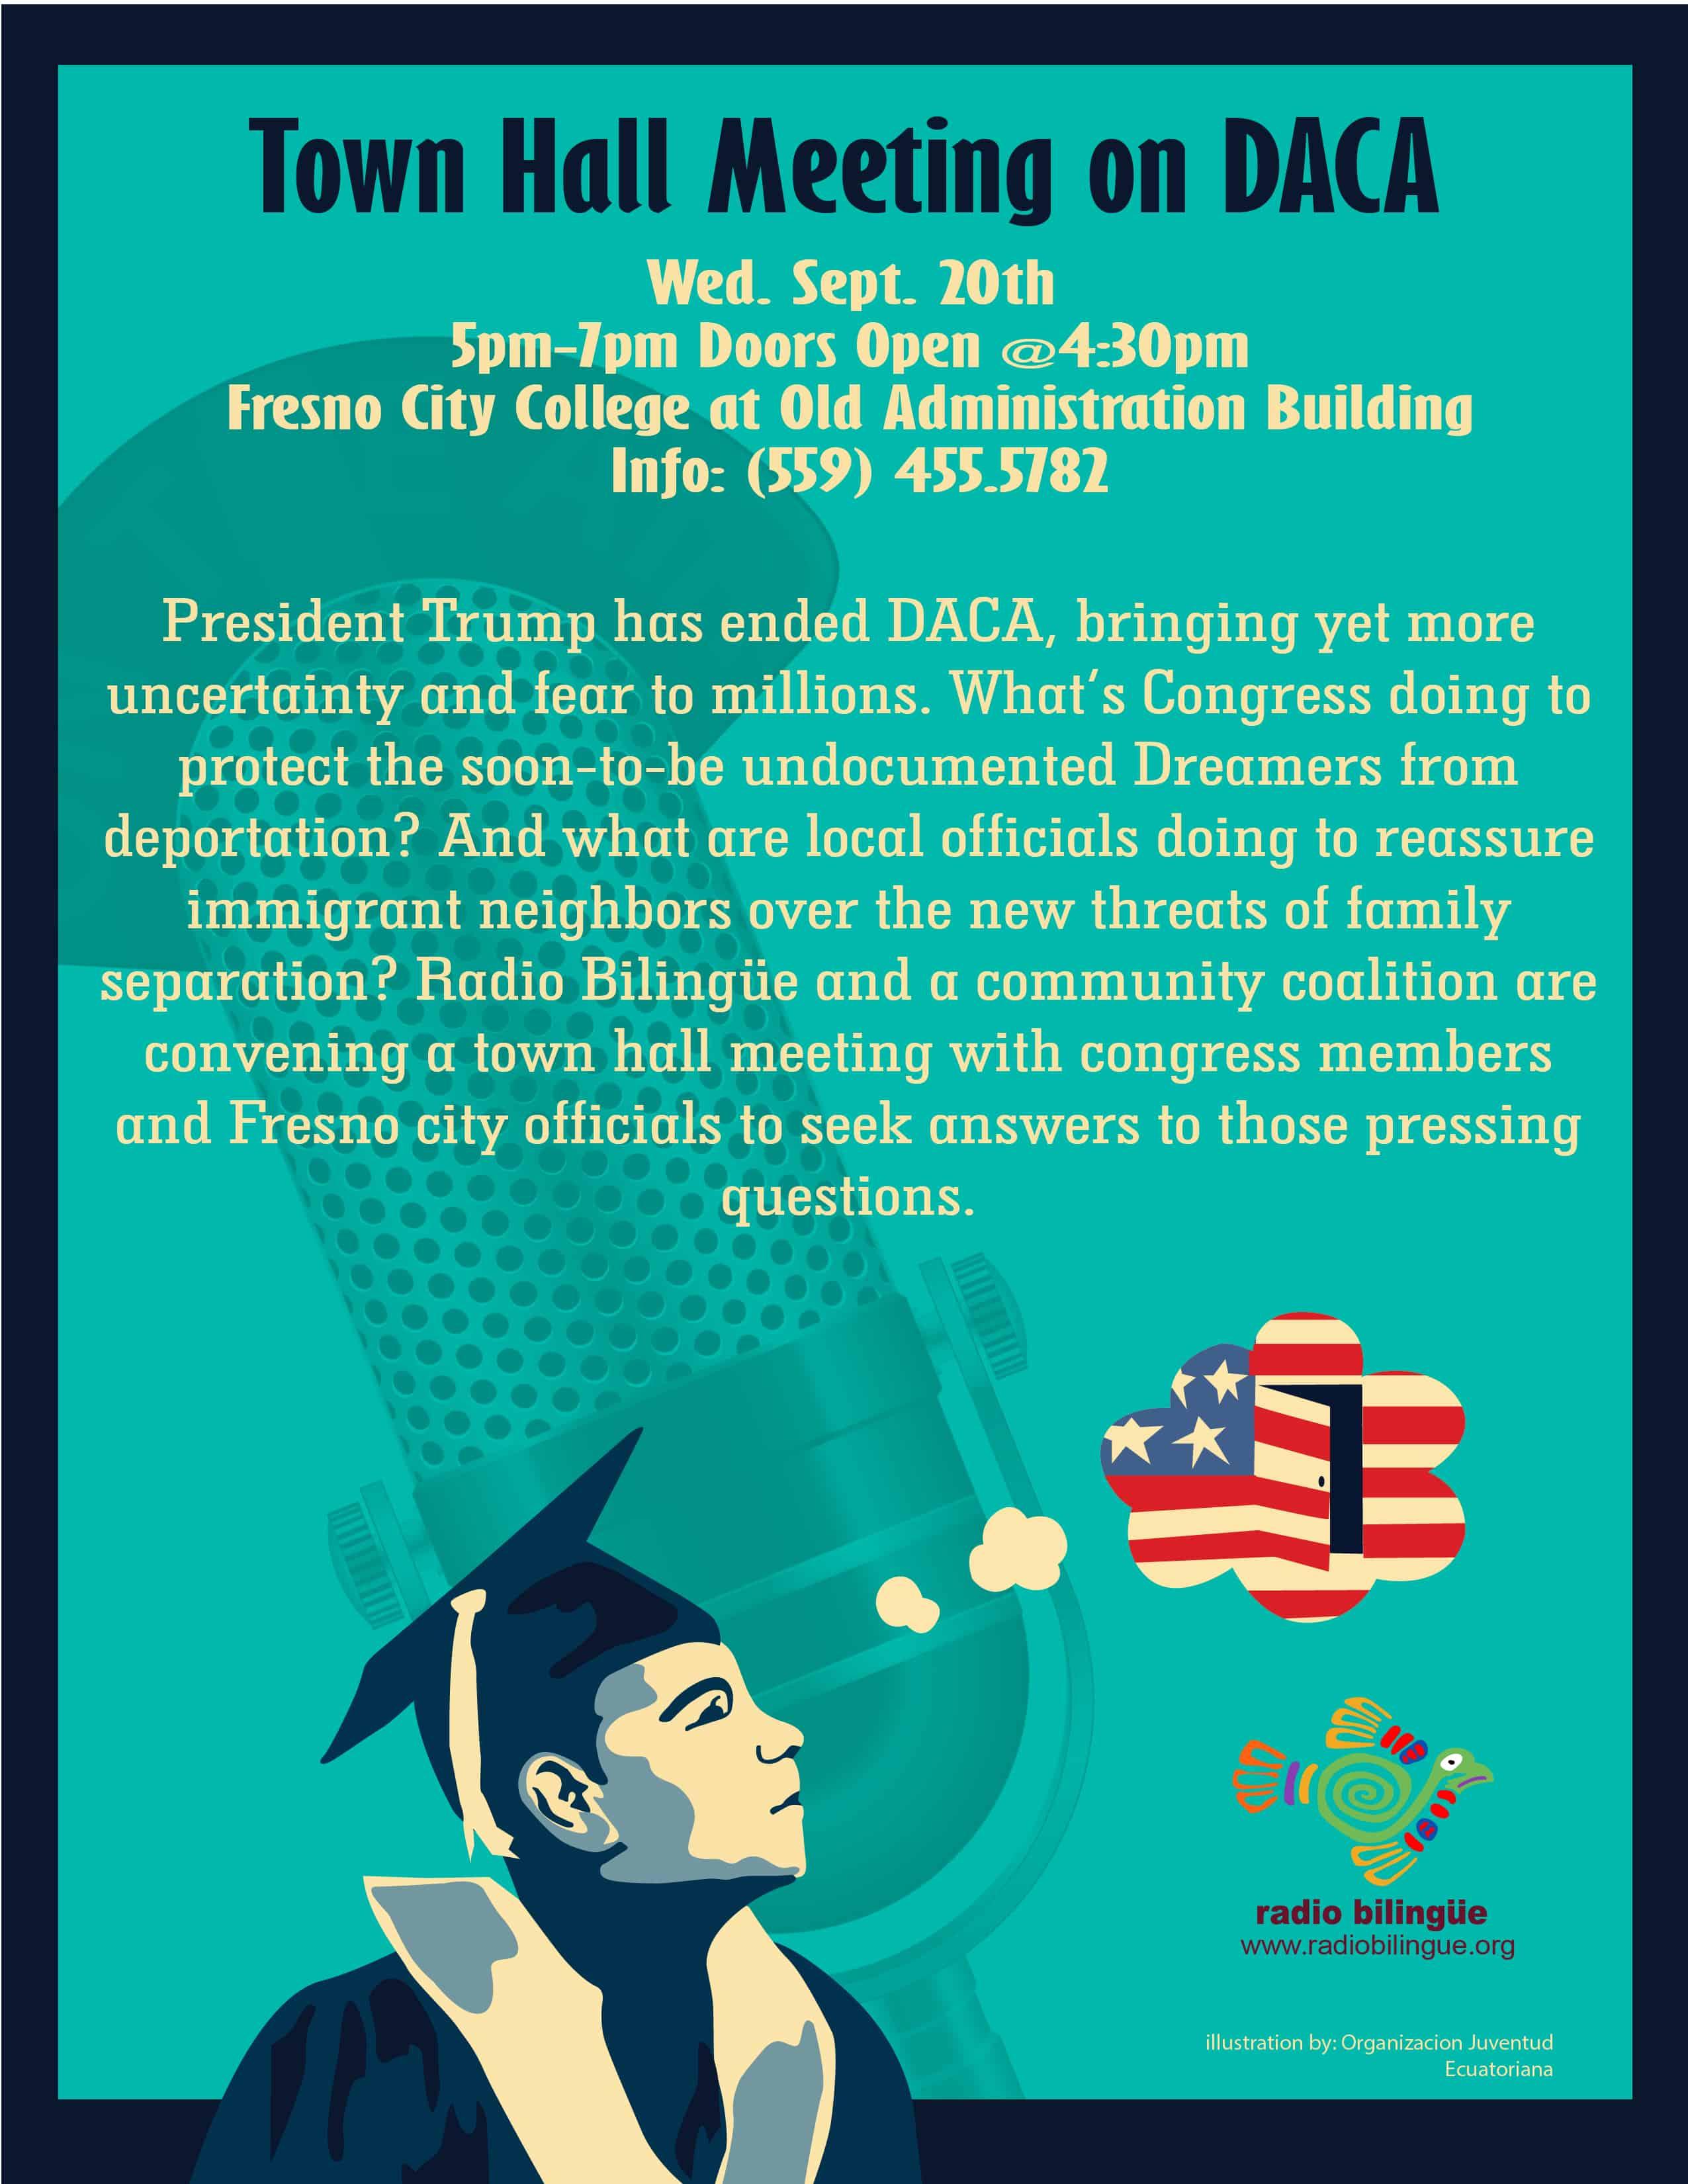 DACA town hall meeting in Fresno September 20, 2017